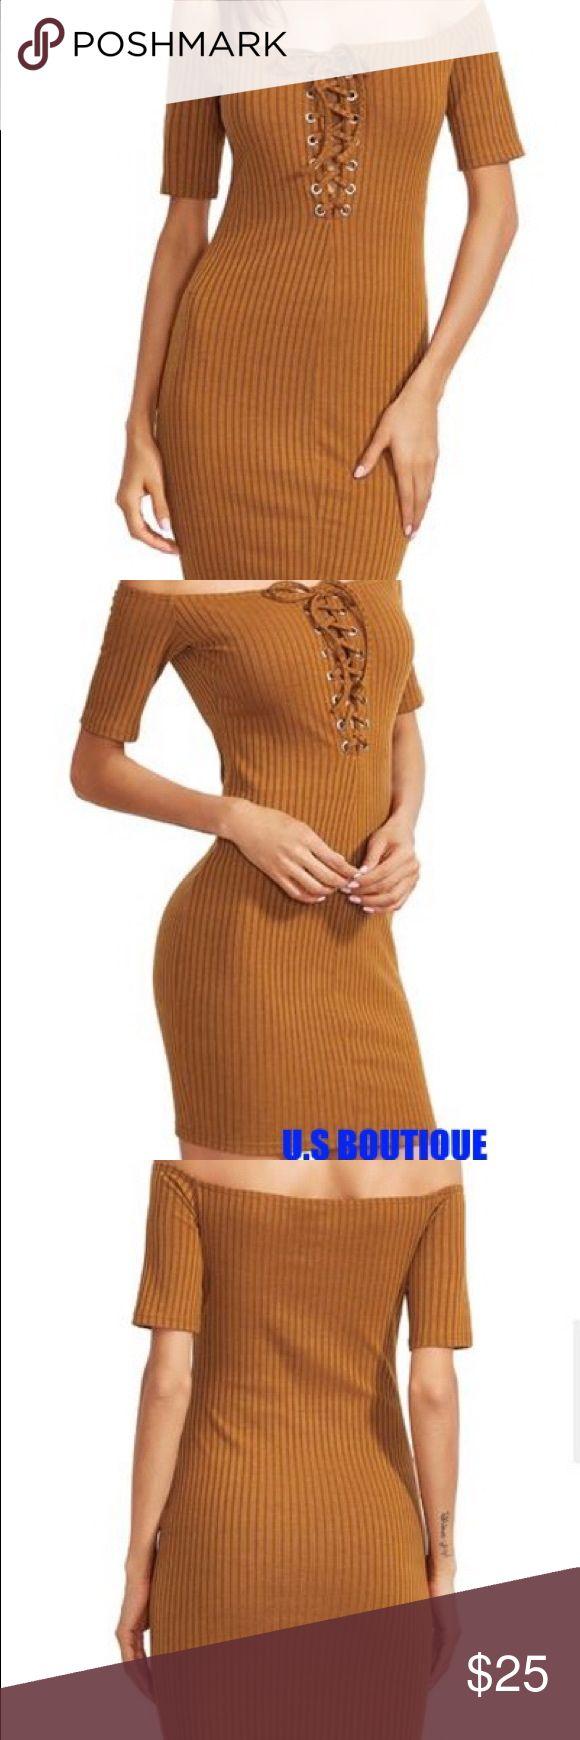 Mustard Off The Shoulder LaceUp Back Bodycon Dress Season: Summer Type: Pencil Pattern Type: Plain Sleeve Length(cm): XS:19cm, S:19.5cm, M:20cm, L:20.5cm Color: Brown Dresses Length: Short Style: Club Material: 97% Polyester 3% Spandex Neckline: Off the Shoulder Silhouette: Bodycon Dresses Mini